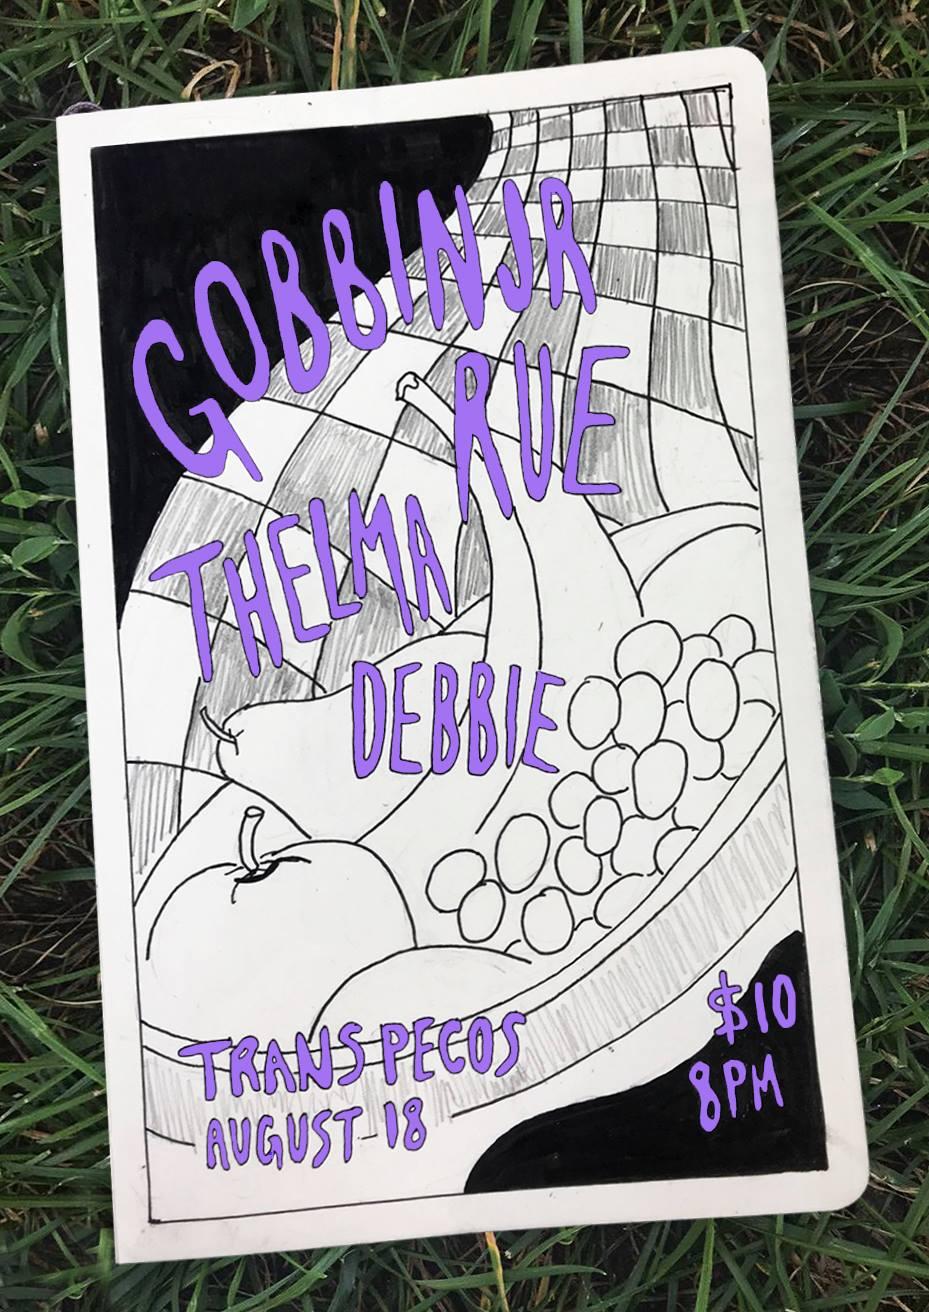 Golden Parachute presents  : gobbinjr  :: Rue  ::: Thelma  :::: Debbie  8pm, all ages, $10